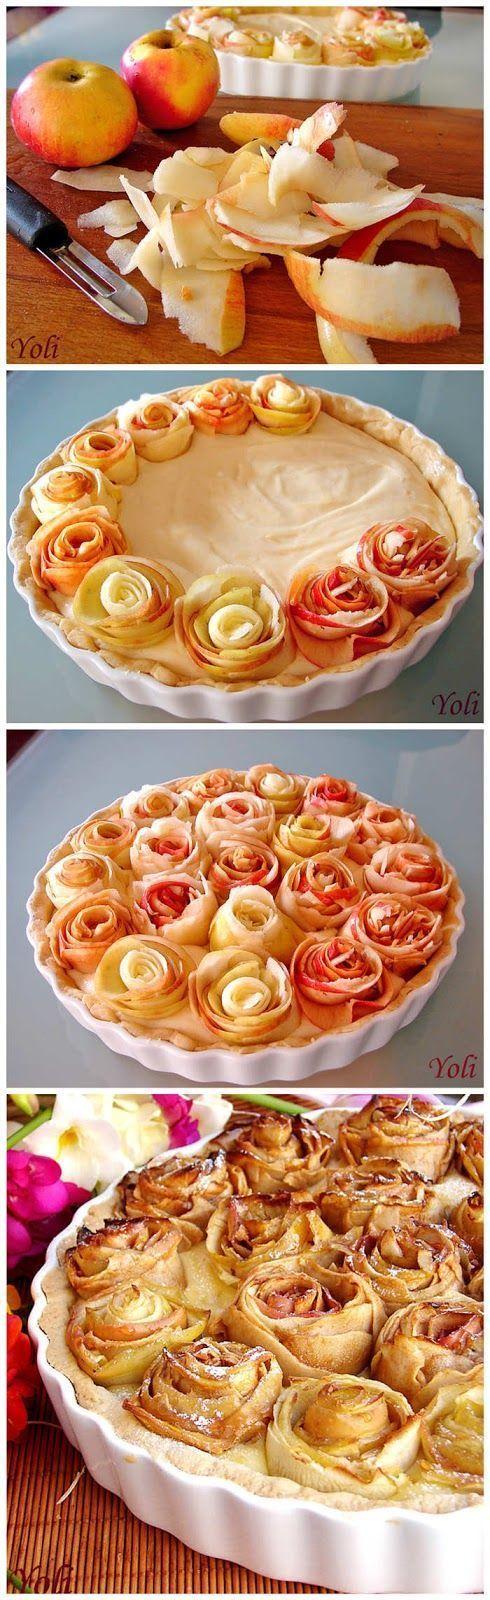 Tarta de rosas de manzana.